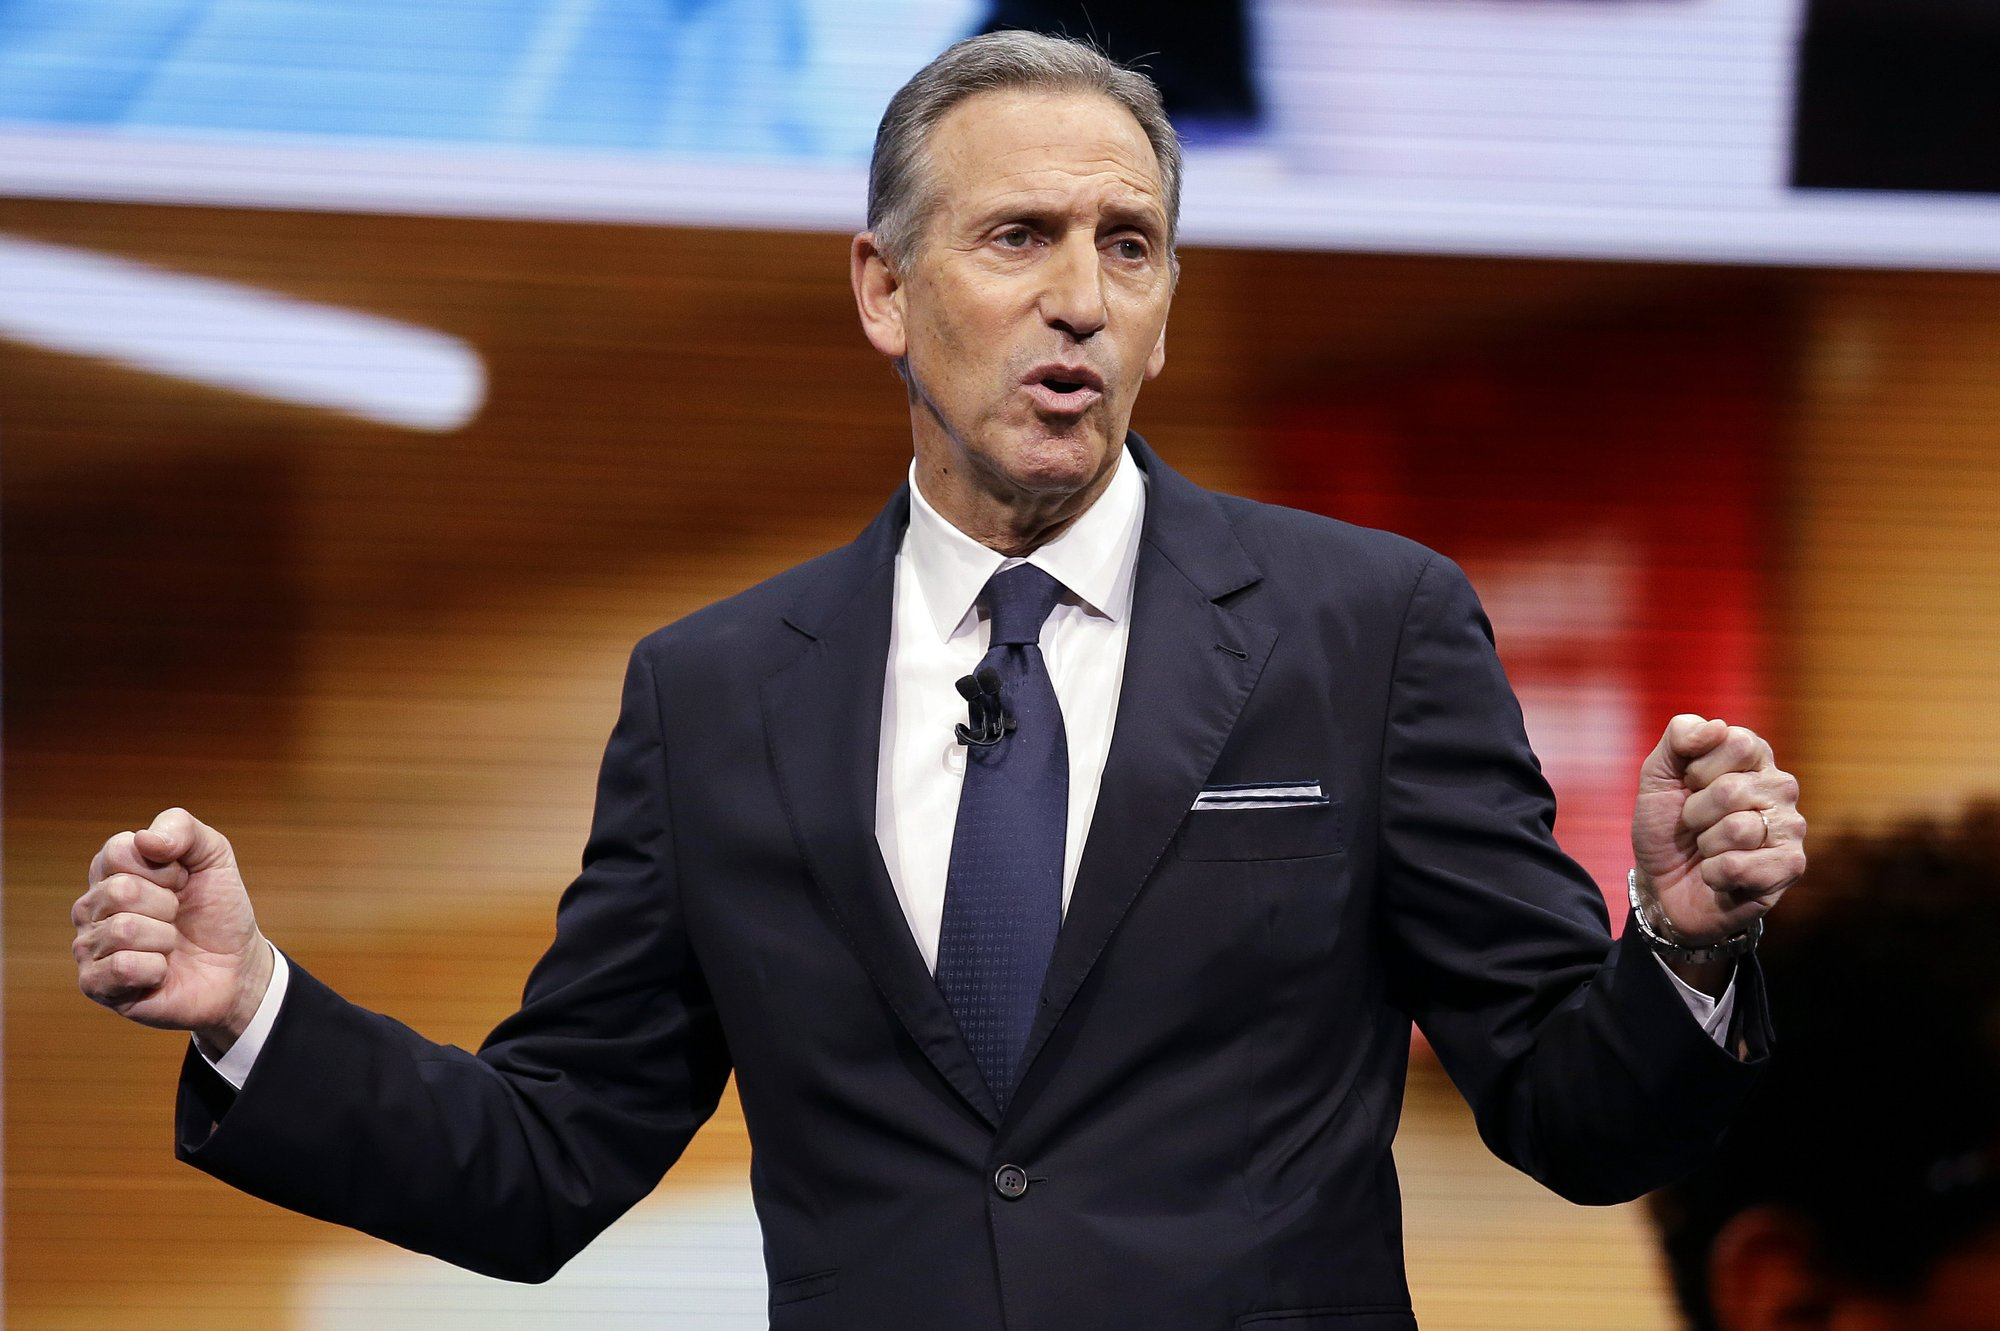 Democrats uneasy about potential Howard Schultz bid